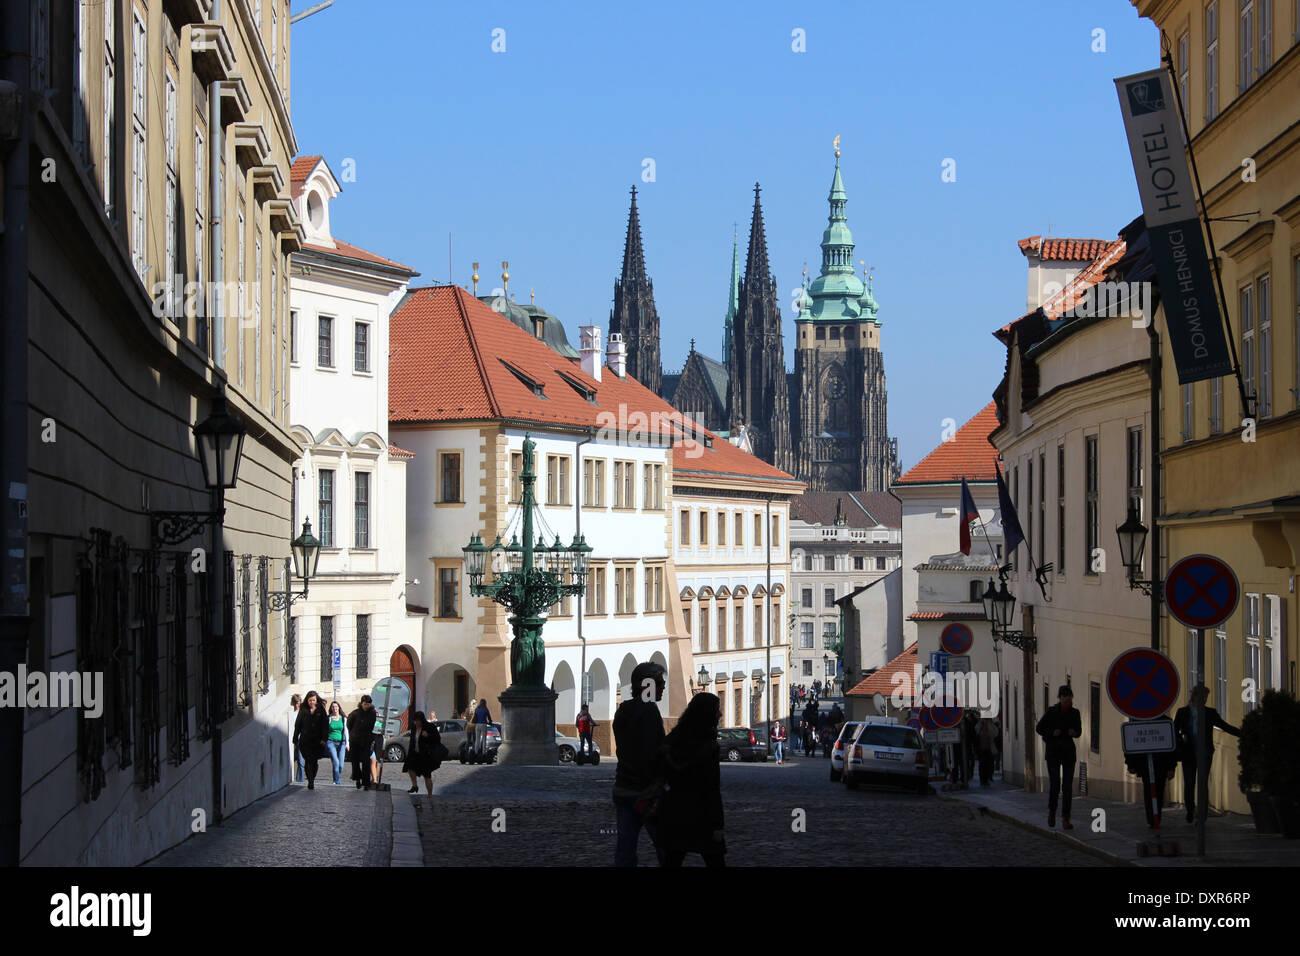 View down Lorelanska toward Saint Vitus cathedral, Prague. - Stock Image